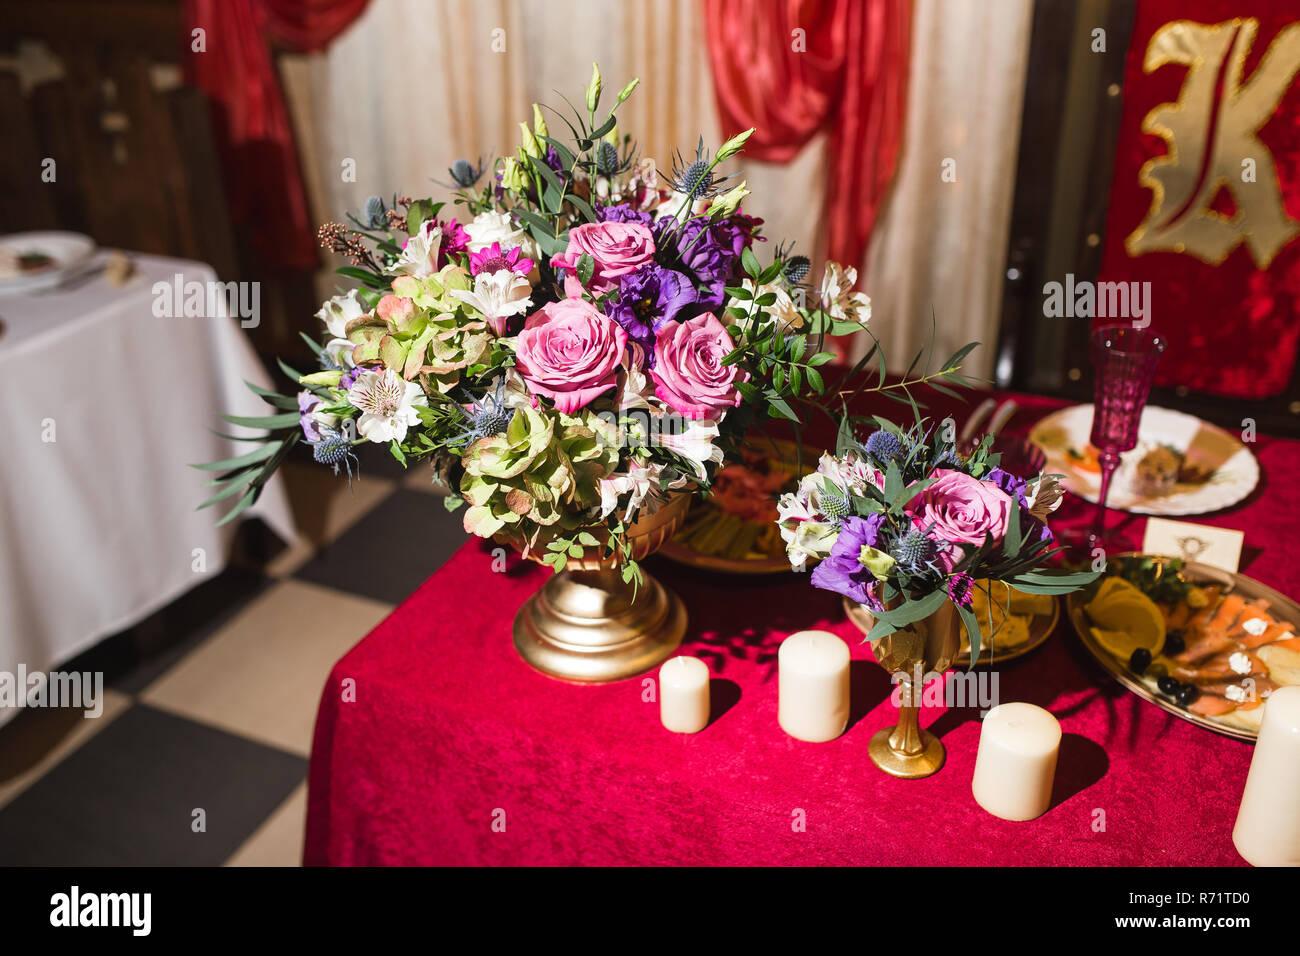 Dekoration Auf Hochzeitsfeier Stockfoto Bild 228078508 Alamy